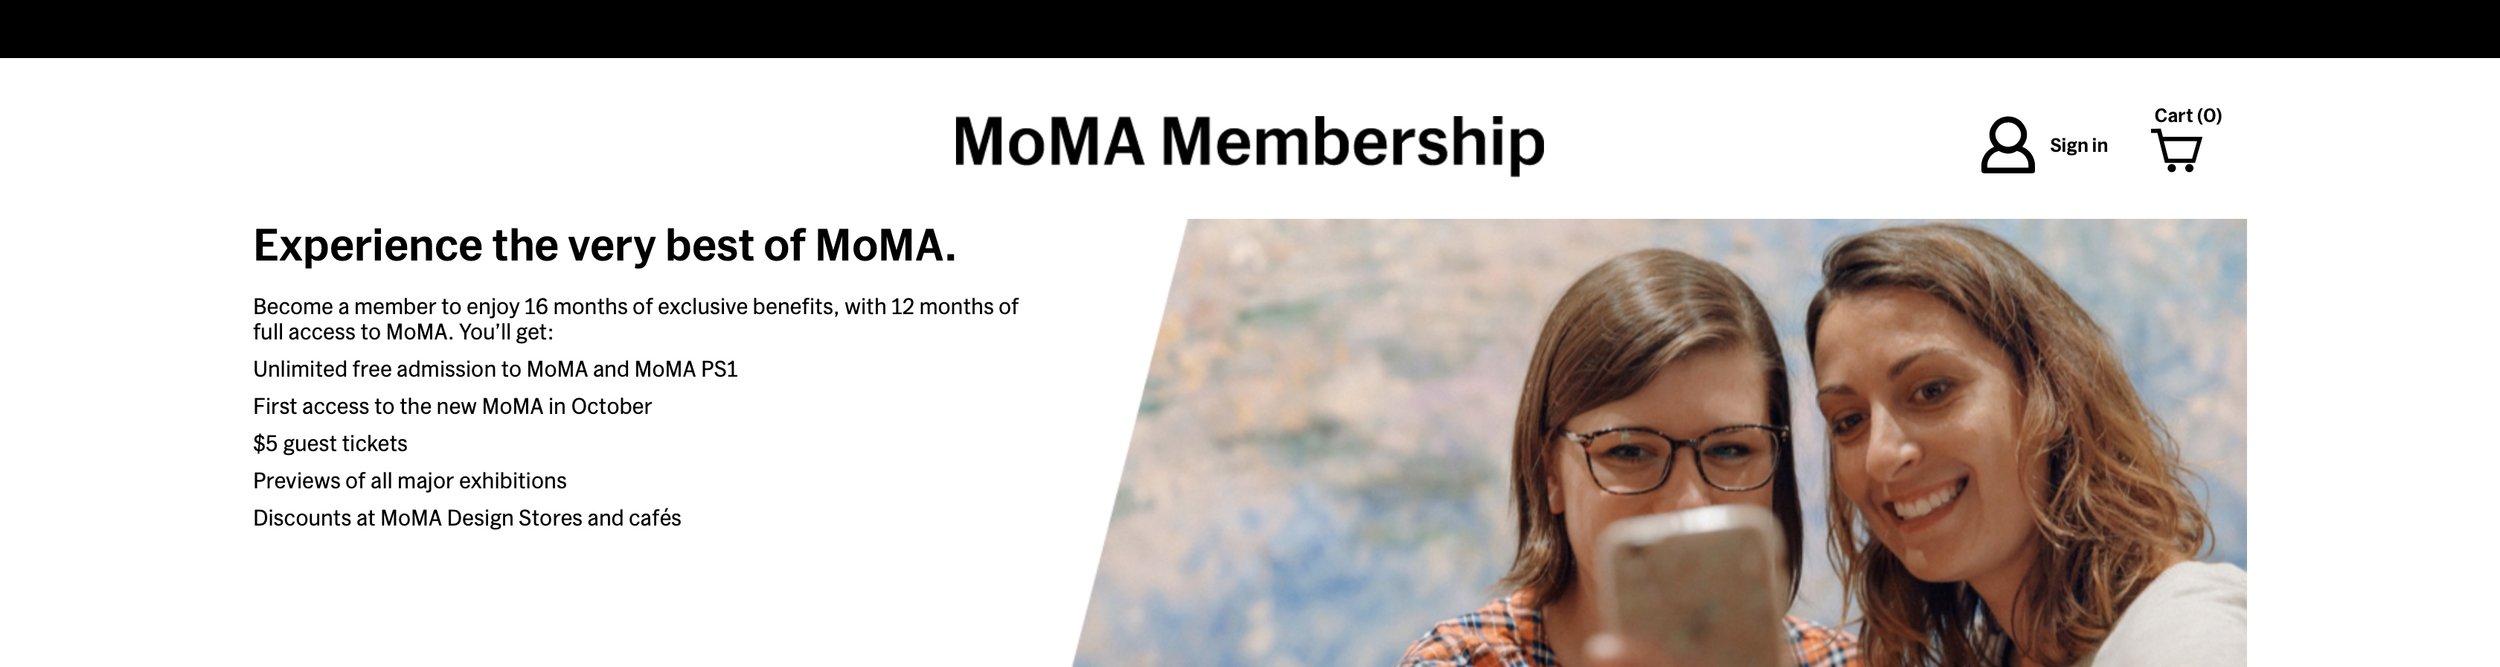 MoMA Membership Navigation